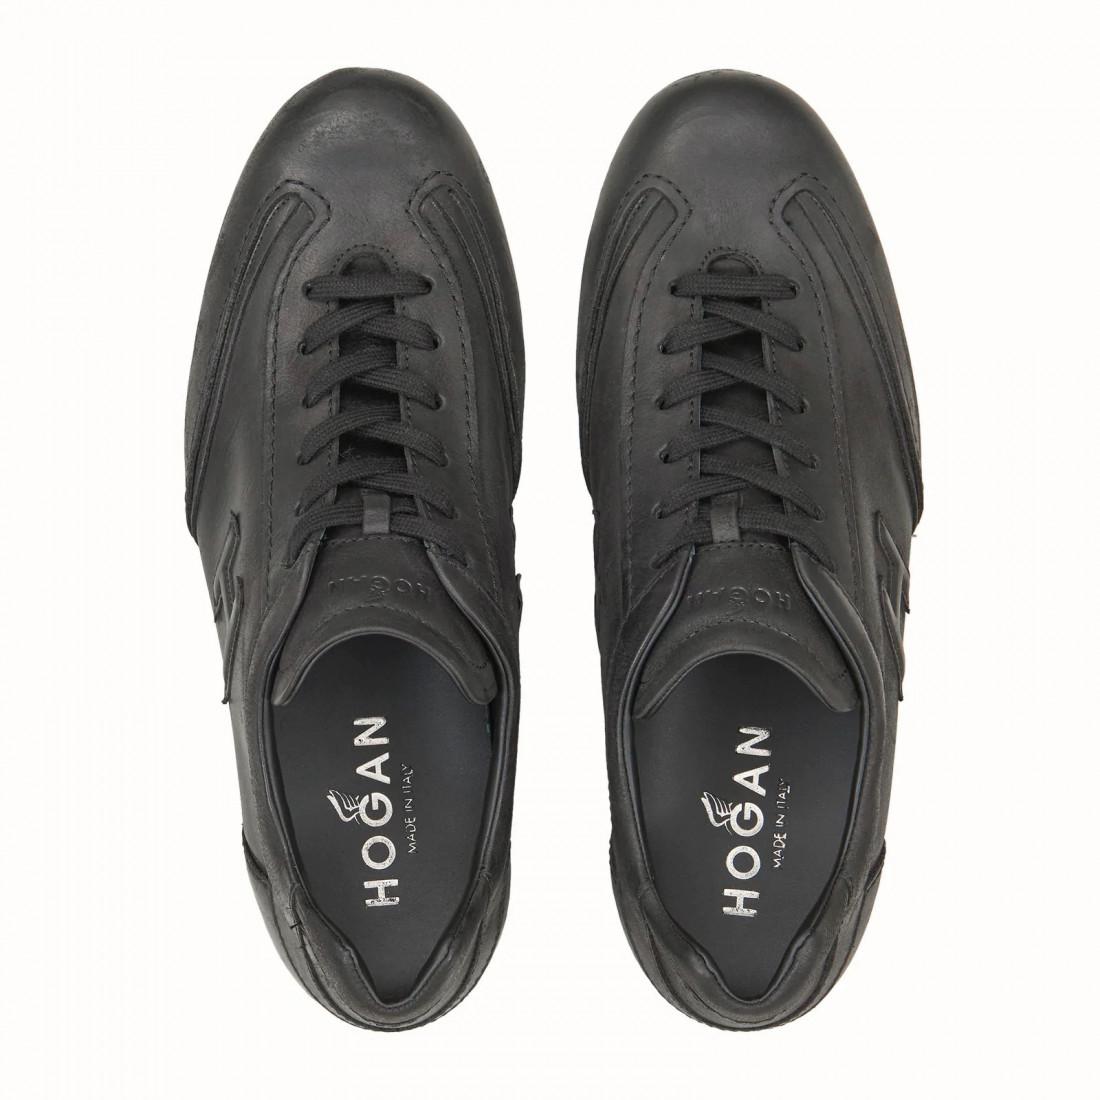 sneakers uomo hogan hxm0520i976px6b999 7537